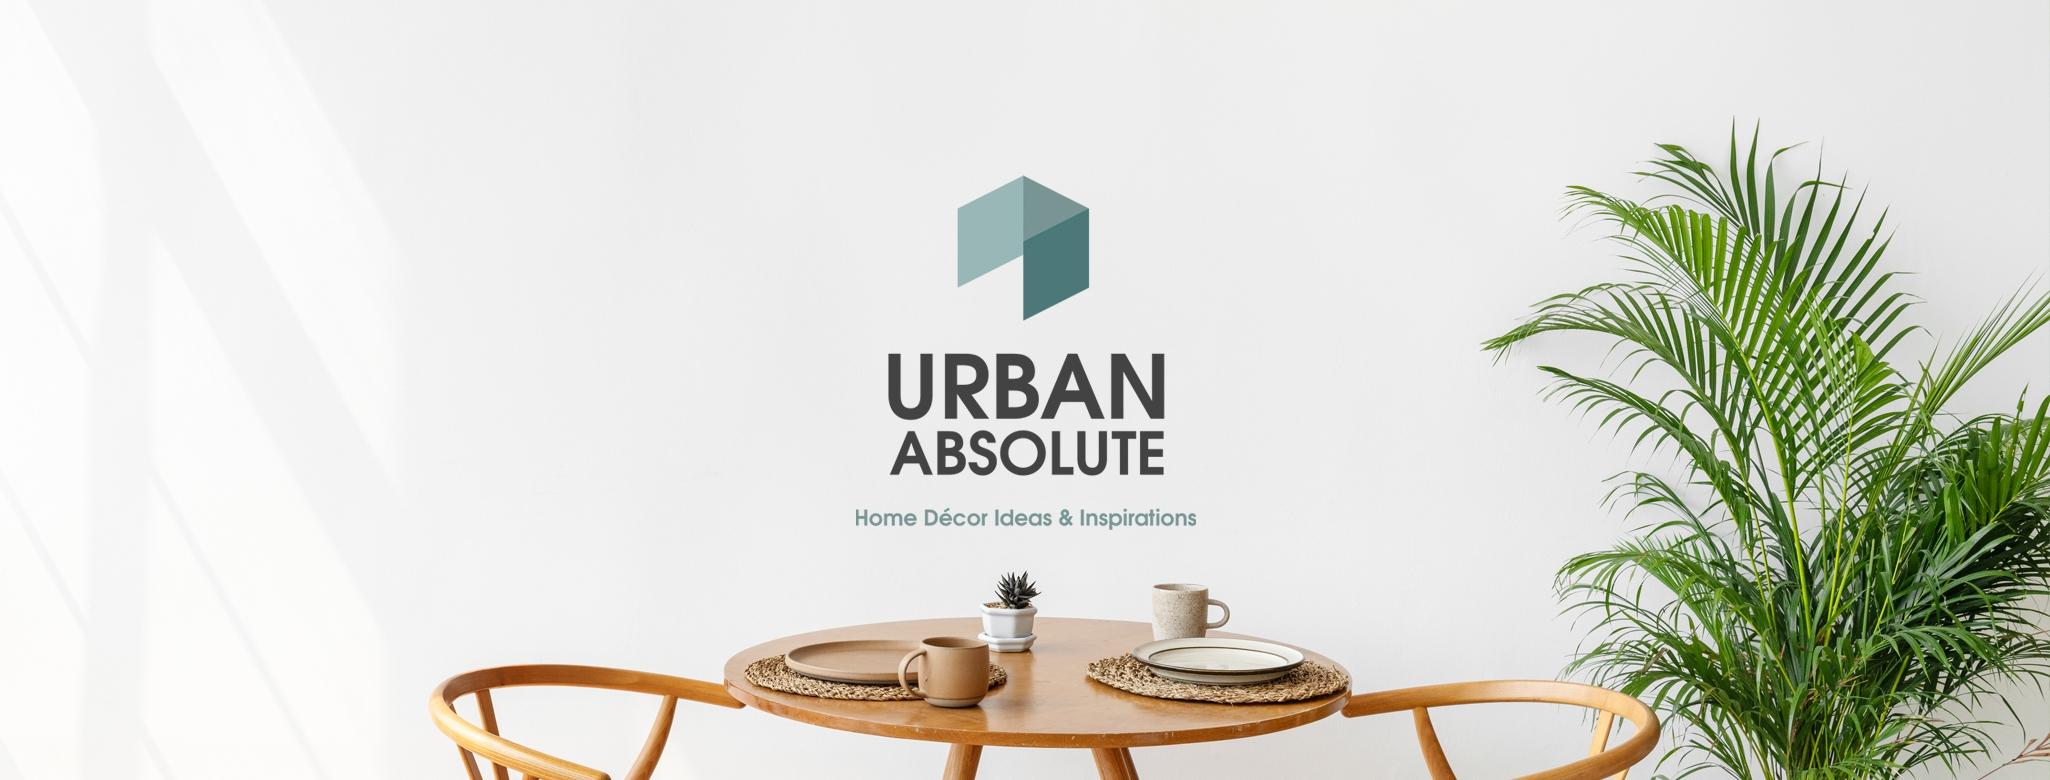 Urban  (@urbanabsolute) Cover Image